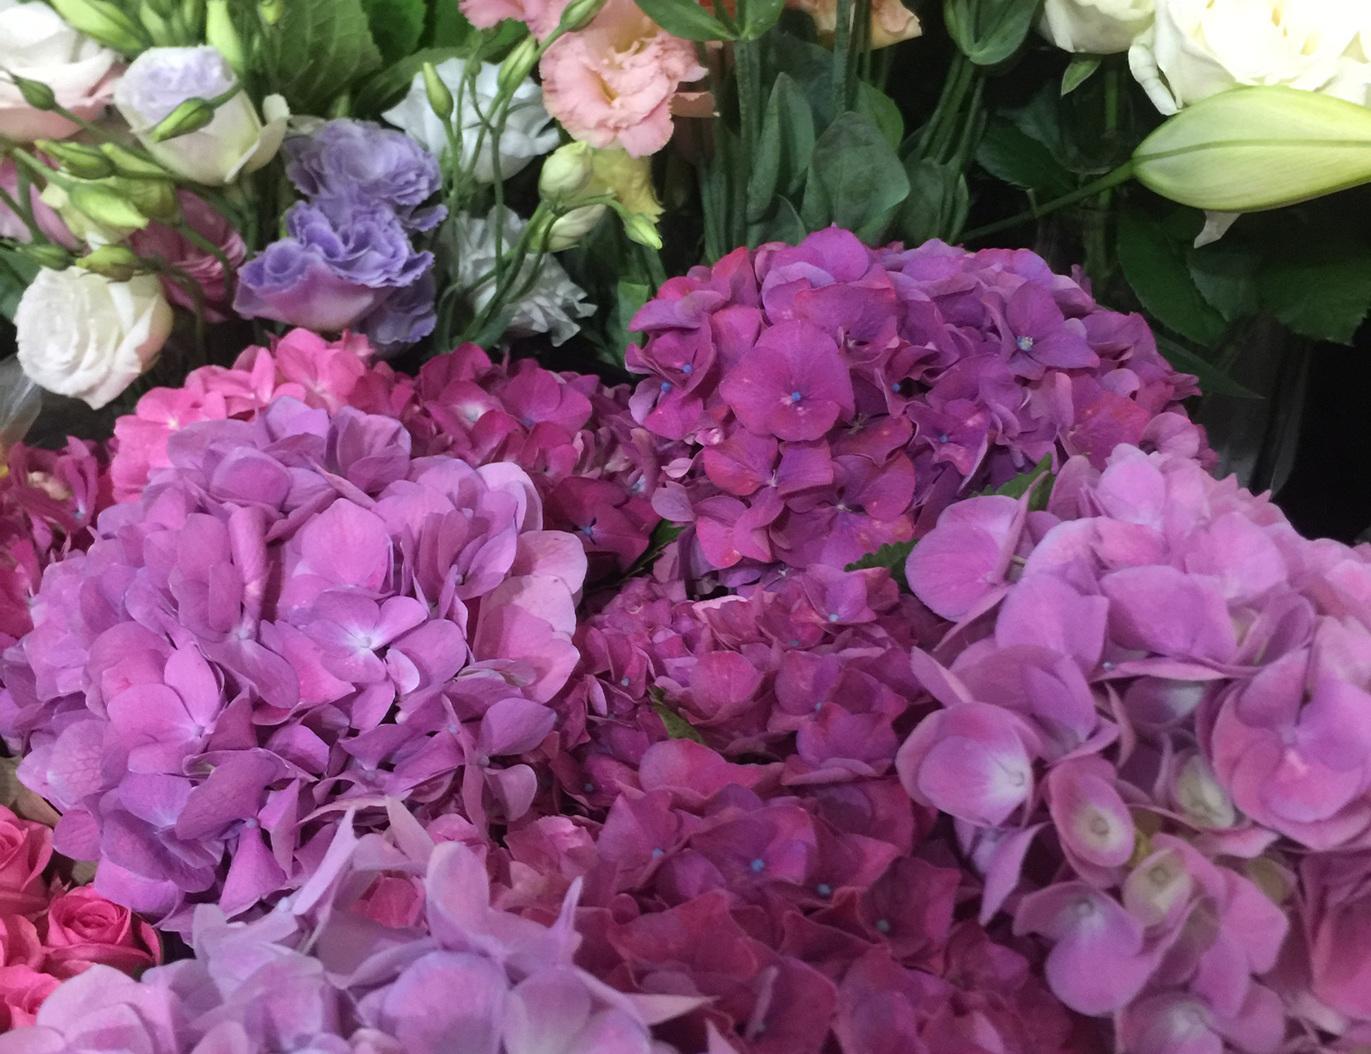 Seasonal quality flowers